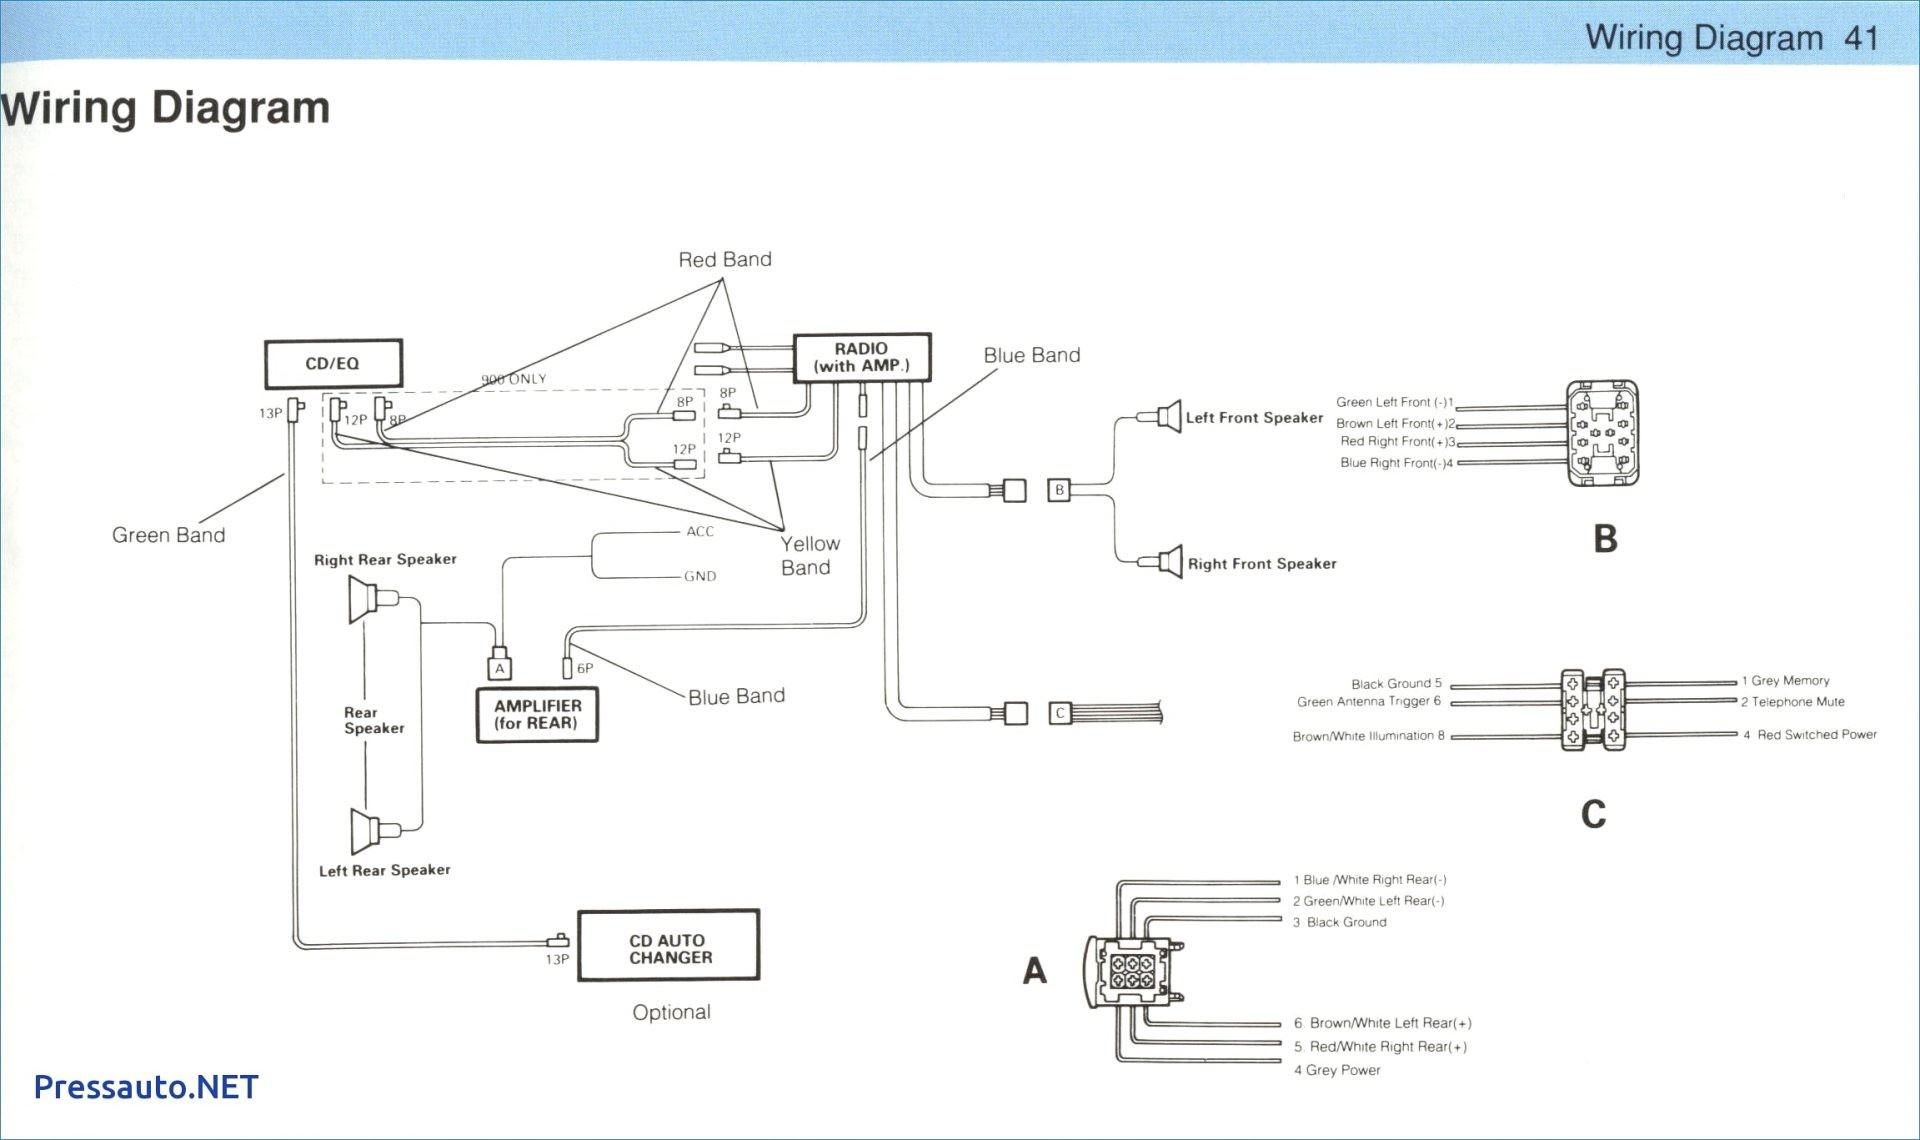 Amazing Emg 89 Wiring Diagram Wiring Library Wiring Cloud Licukshollocom